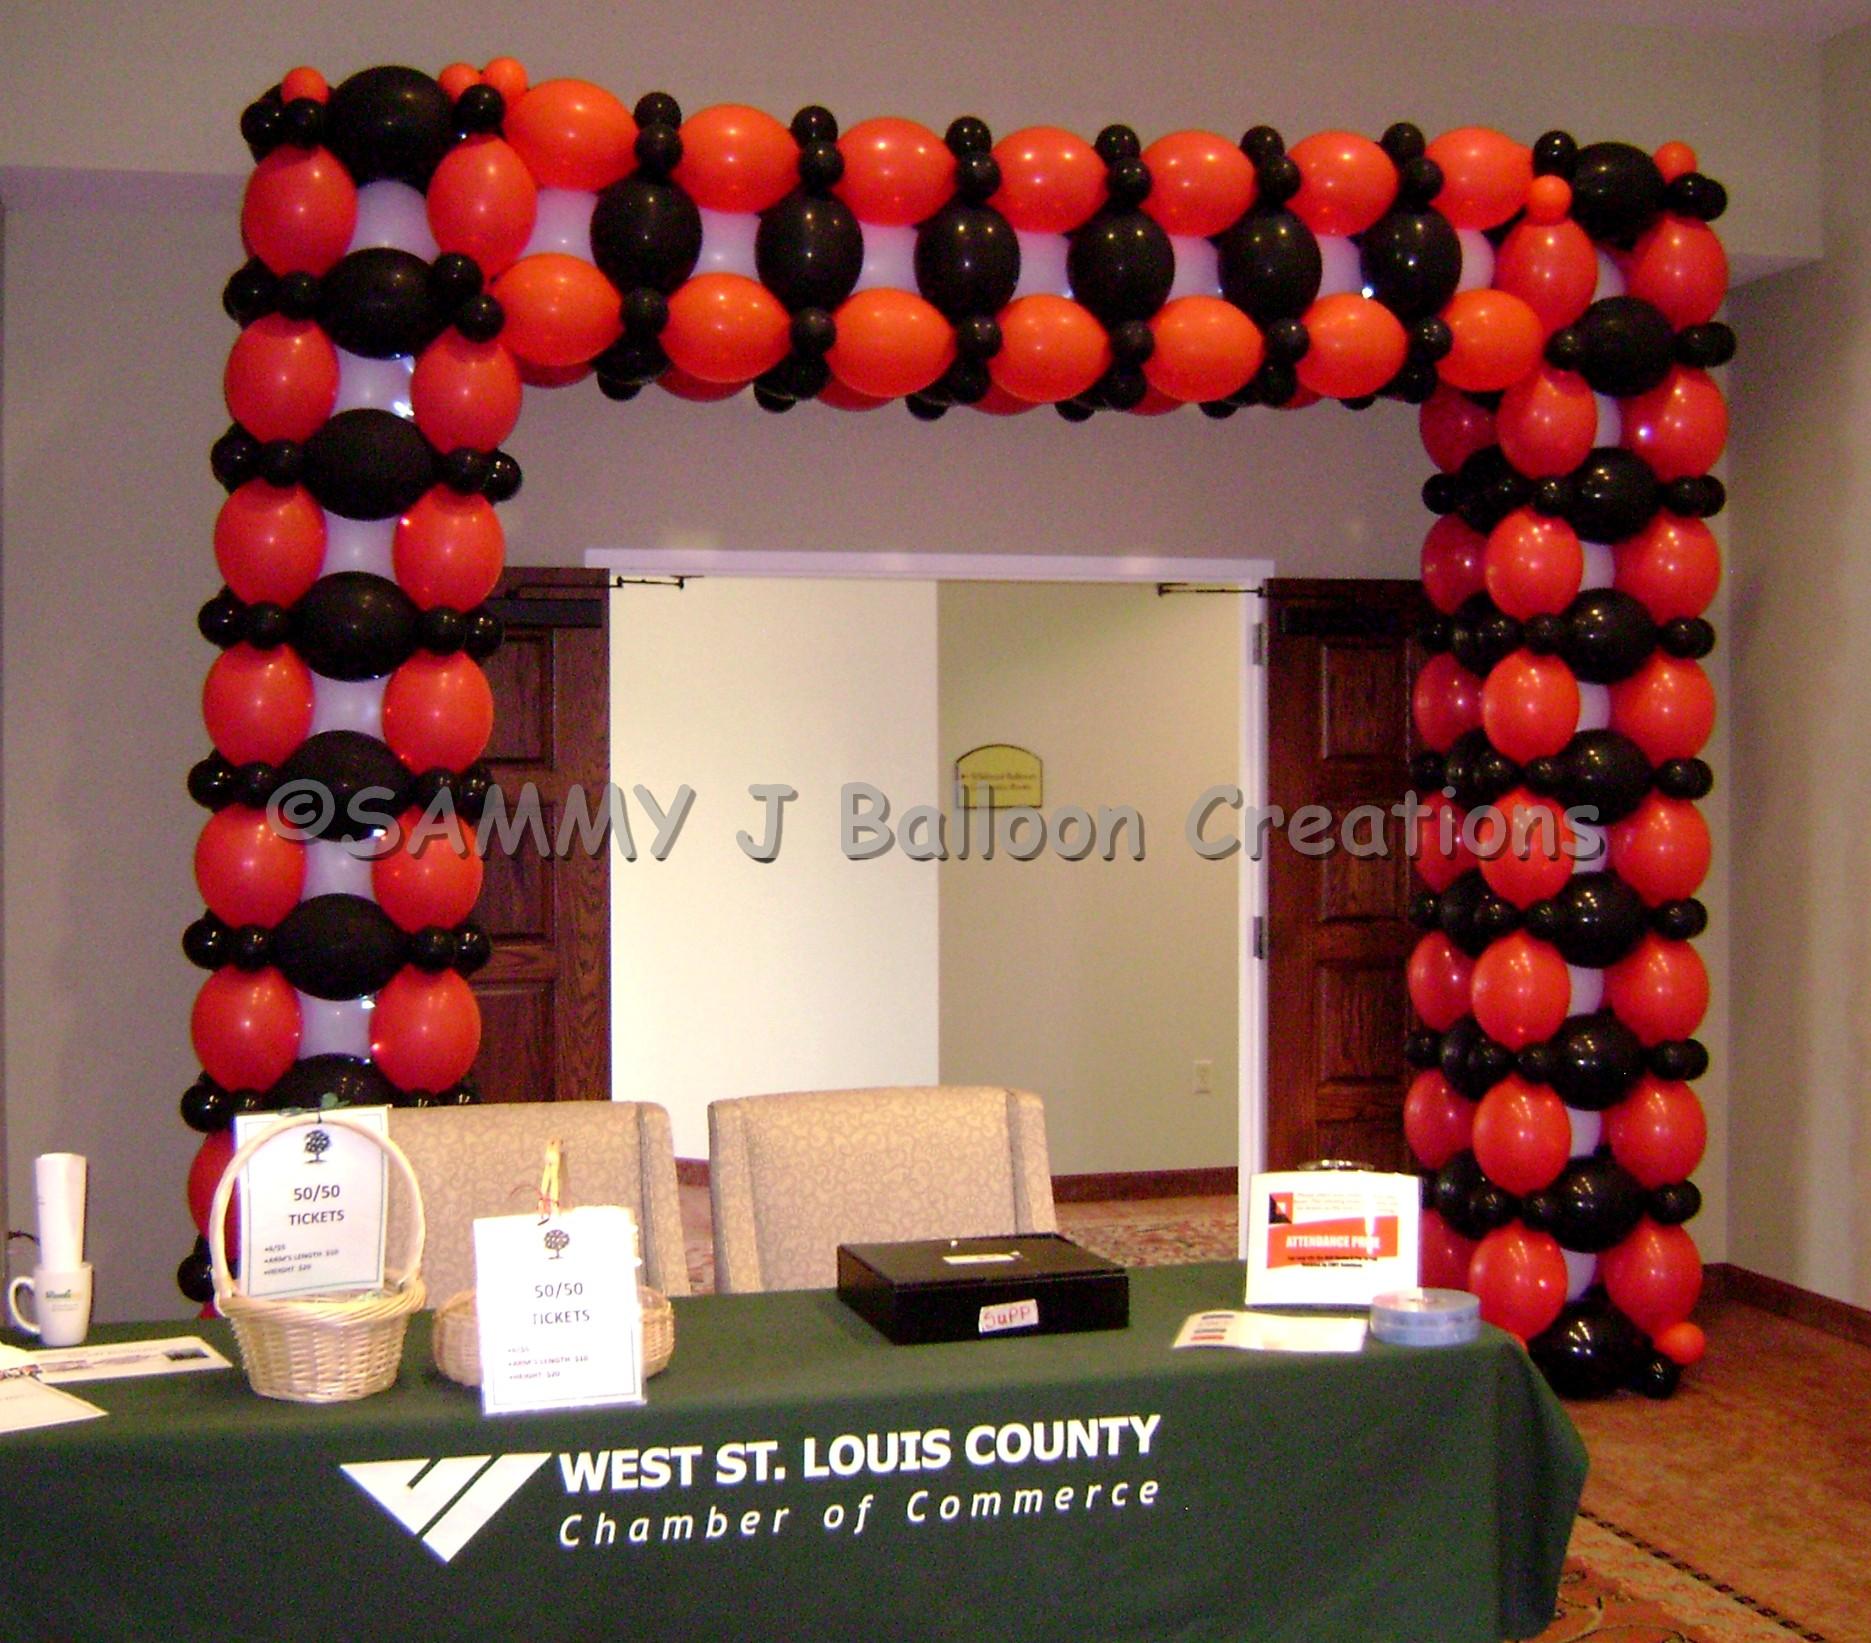 SAMMY J Balloon Creations st louis balloons casino arch